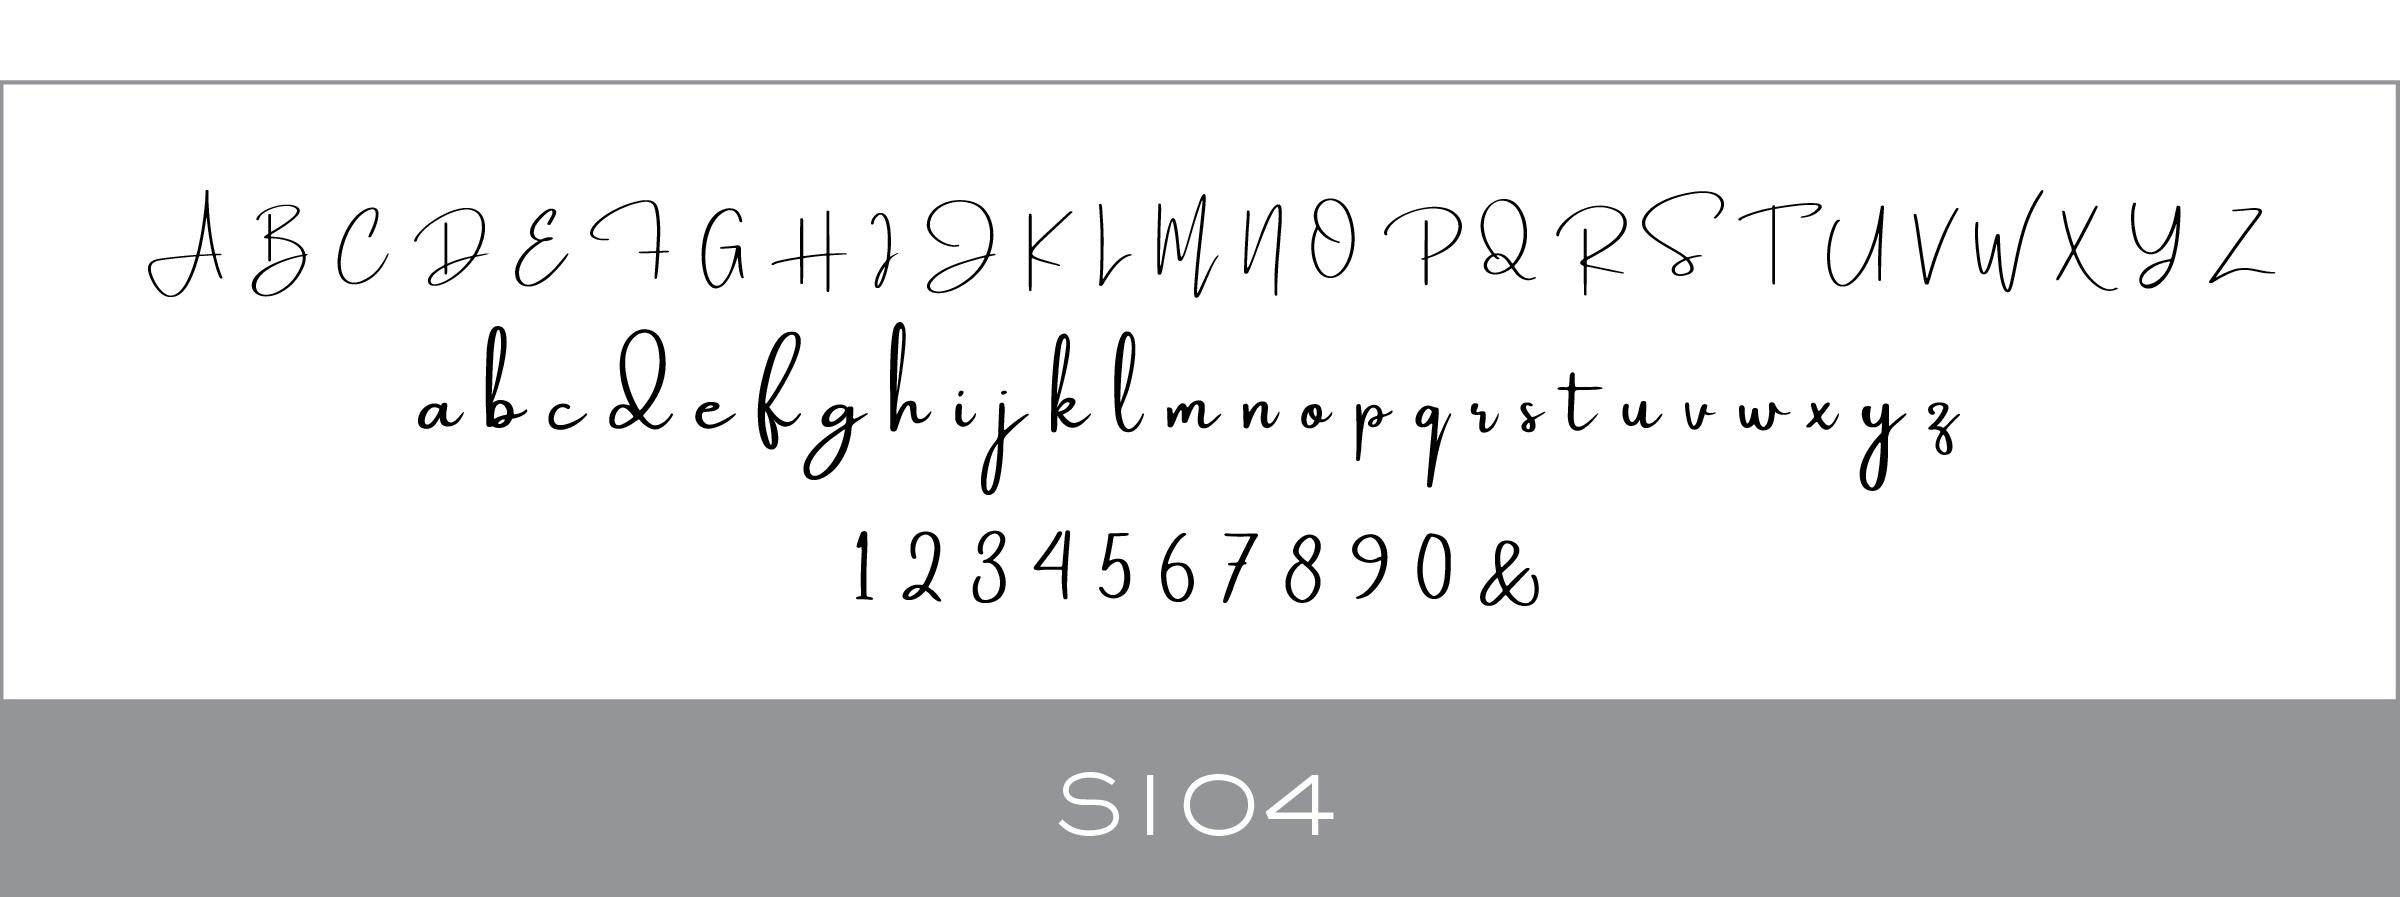 S104_Haute_Papier_Font.jpg